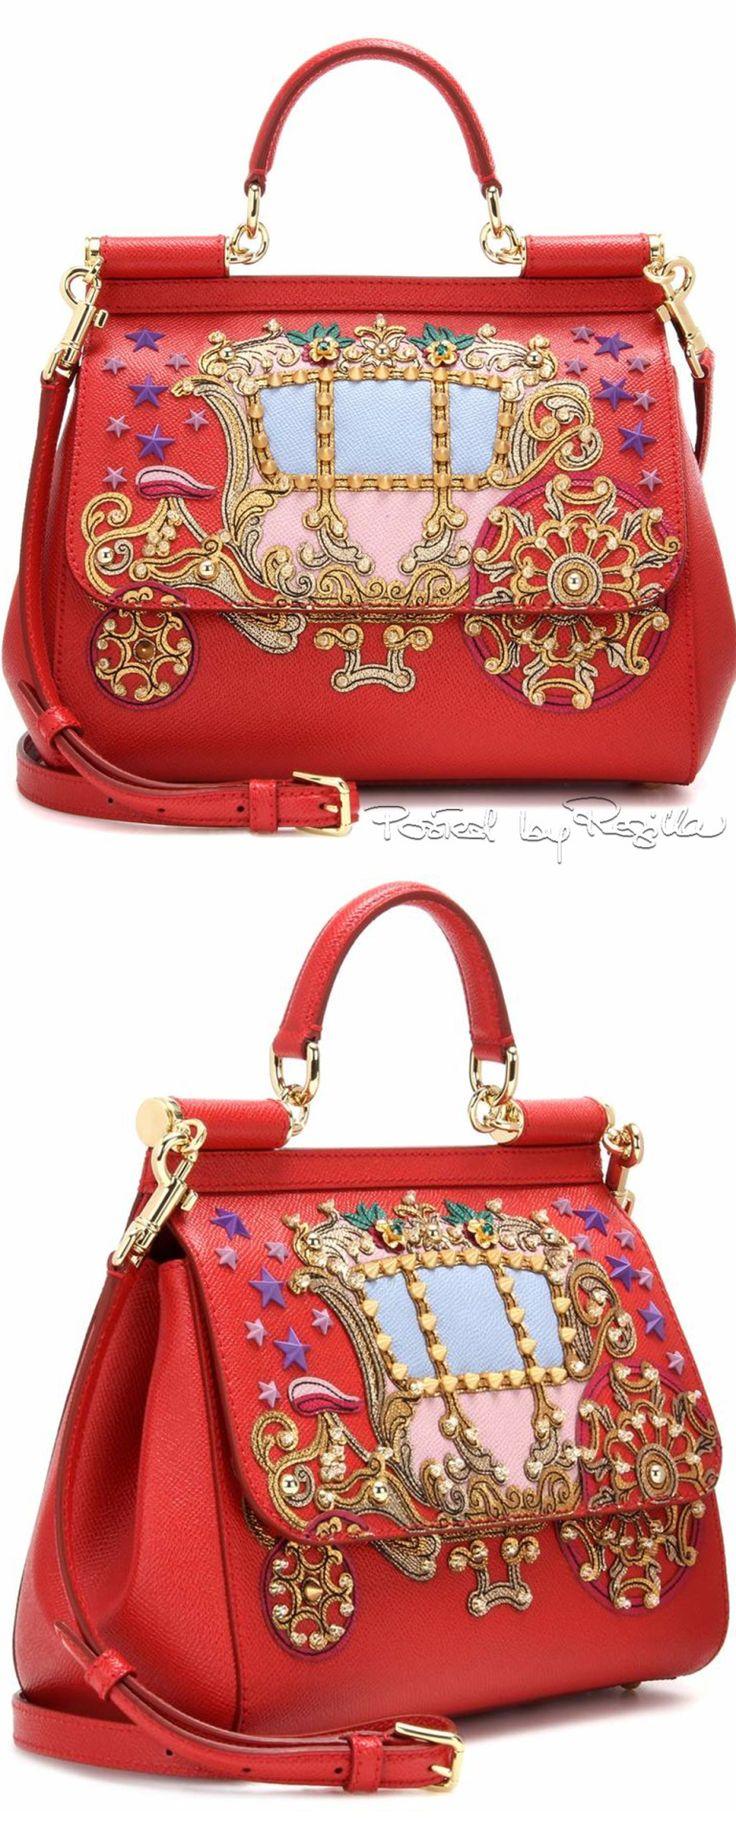 Dolce & Gabbana bag. Reminds me of Cinderella